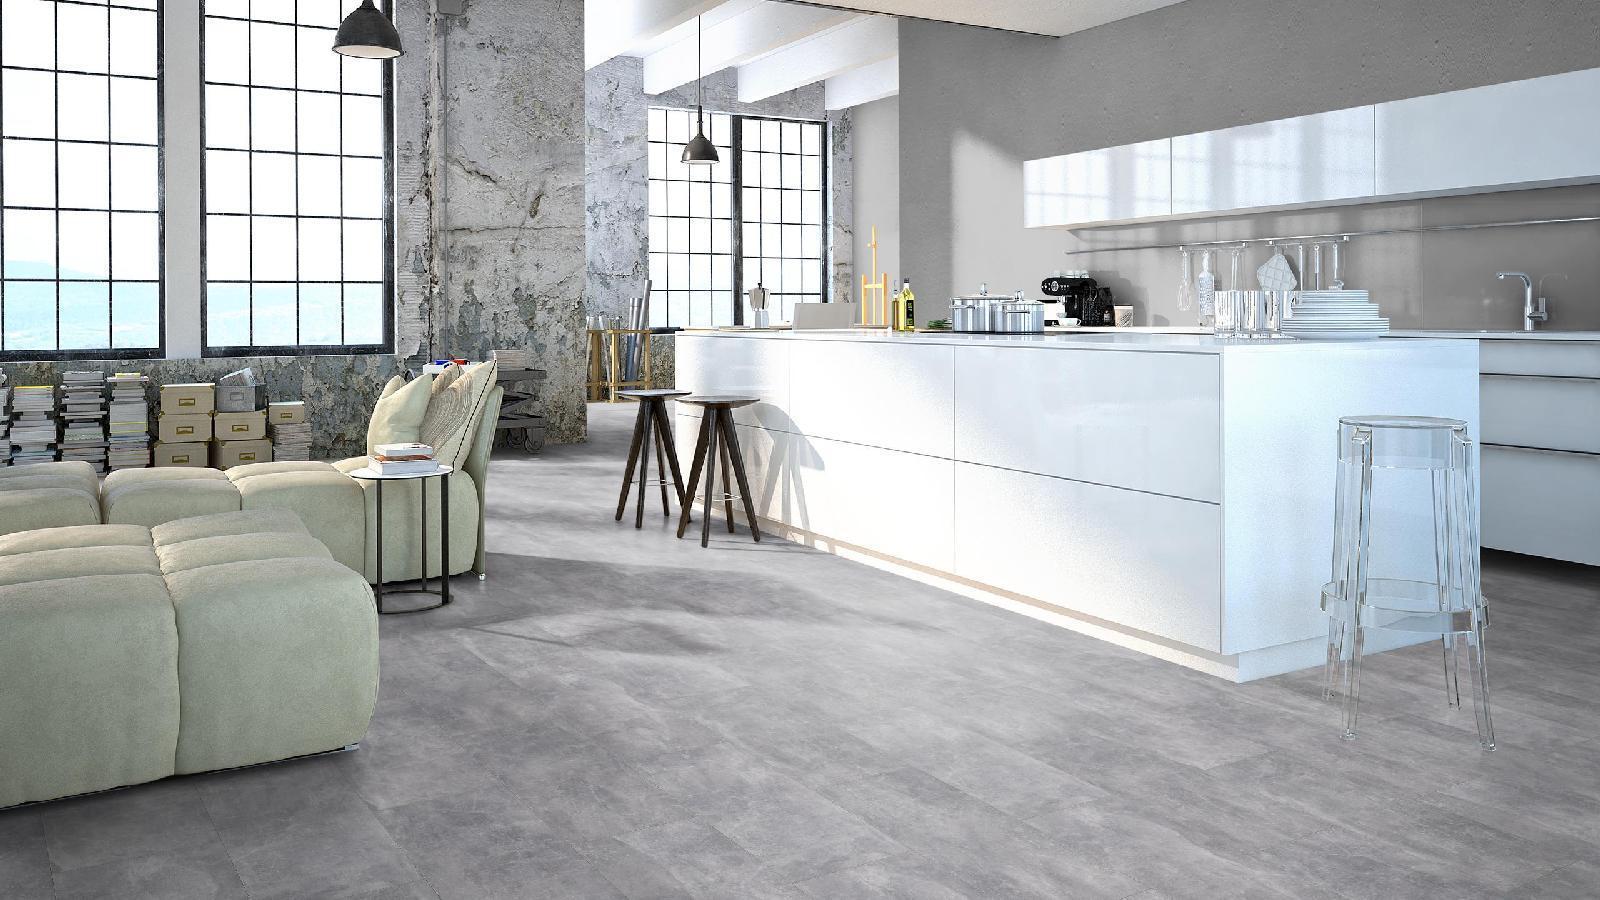 Sicht Estrich 4 ways to use elite concrete in your home